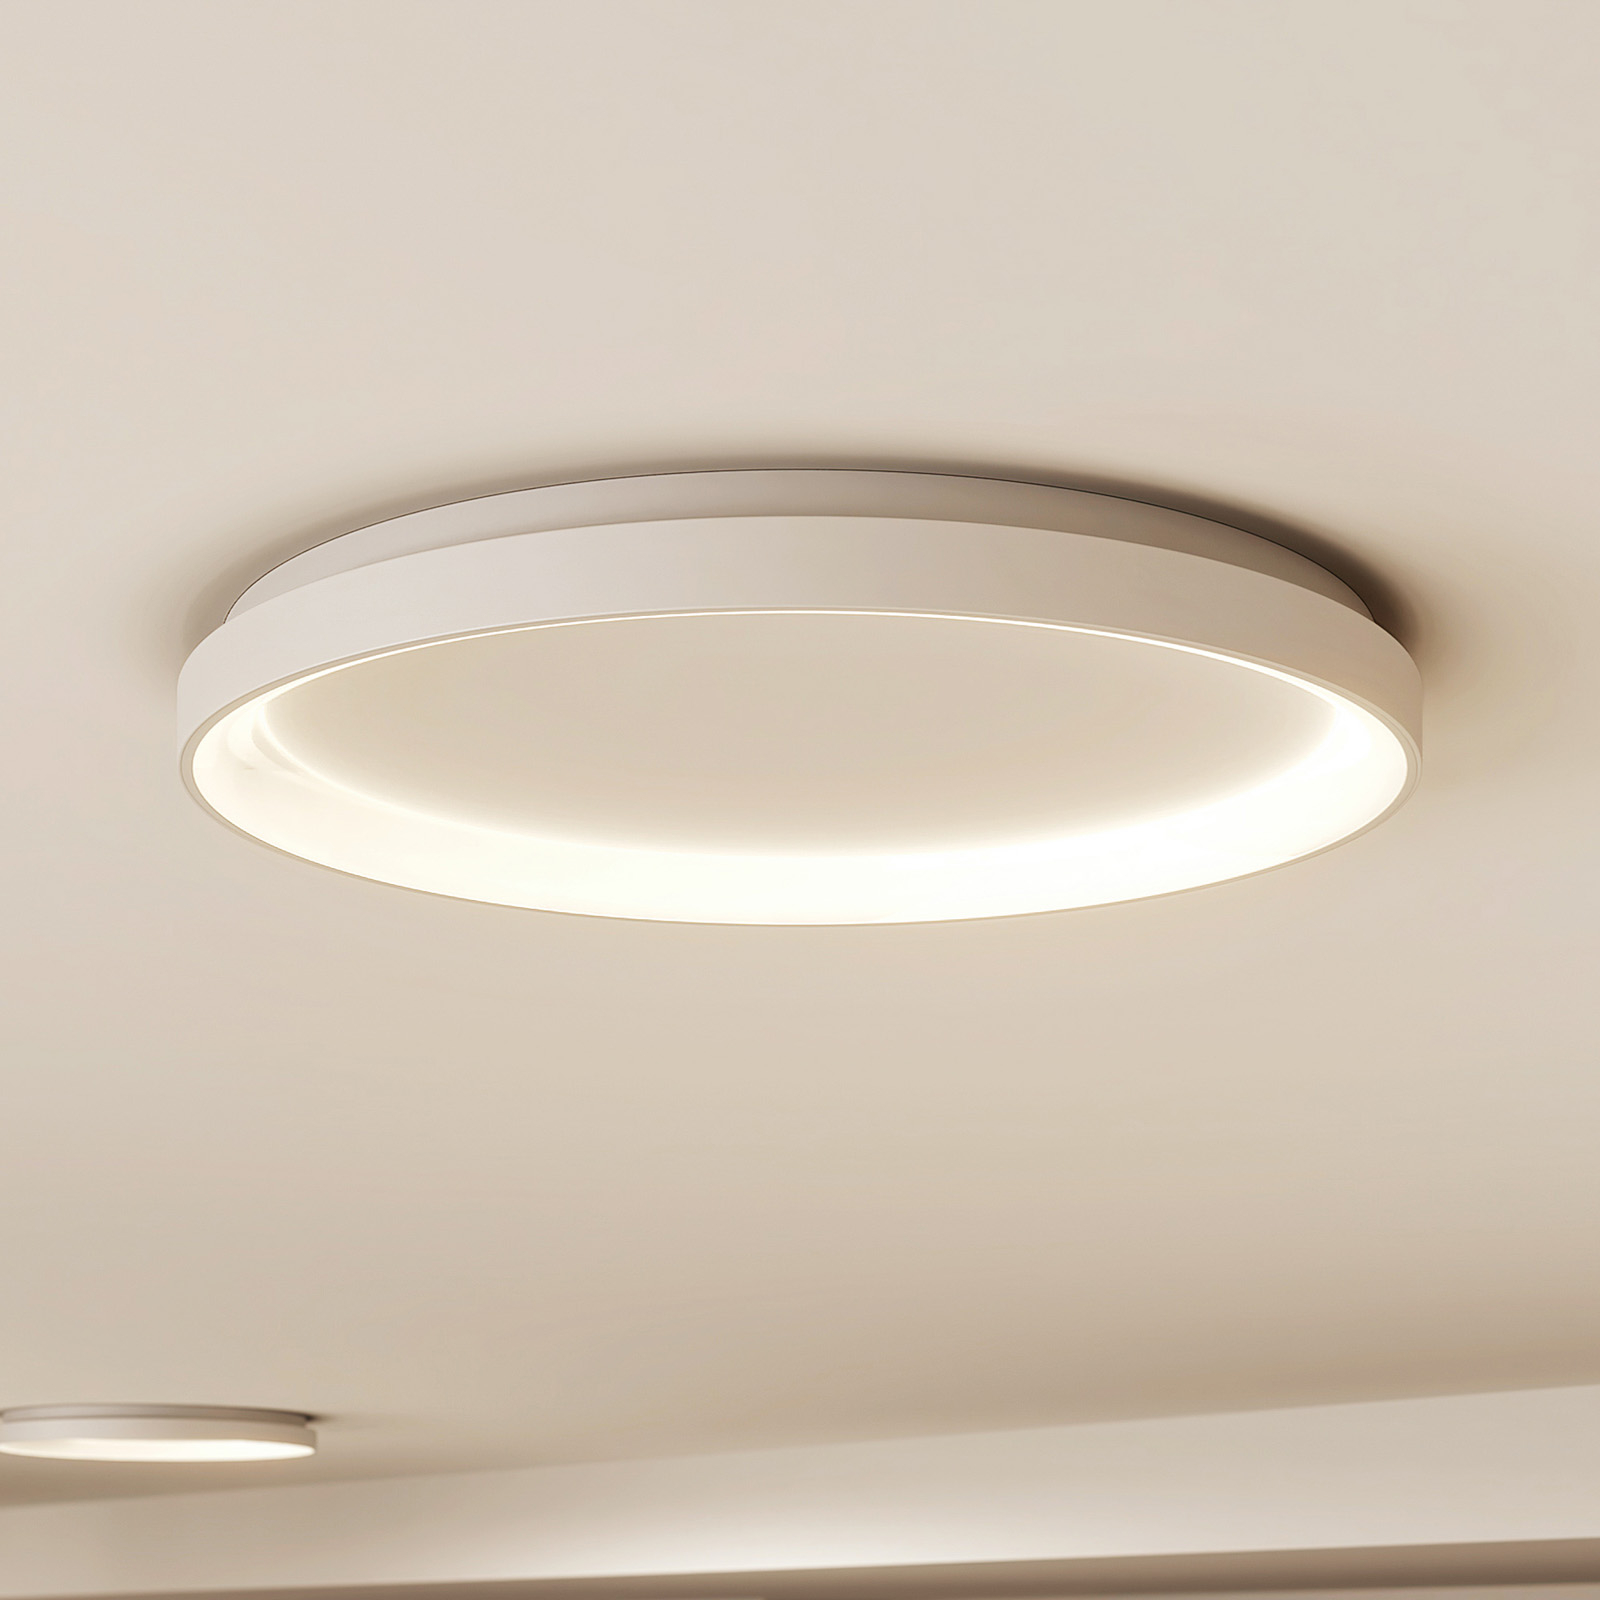 Arcchio Vivy LED-taklampe, hvit